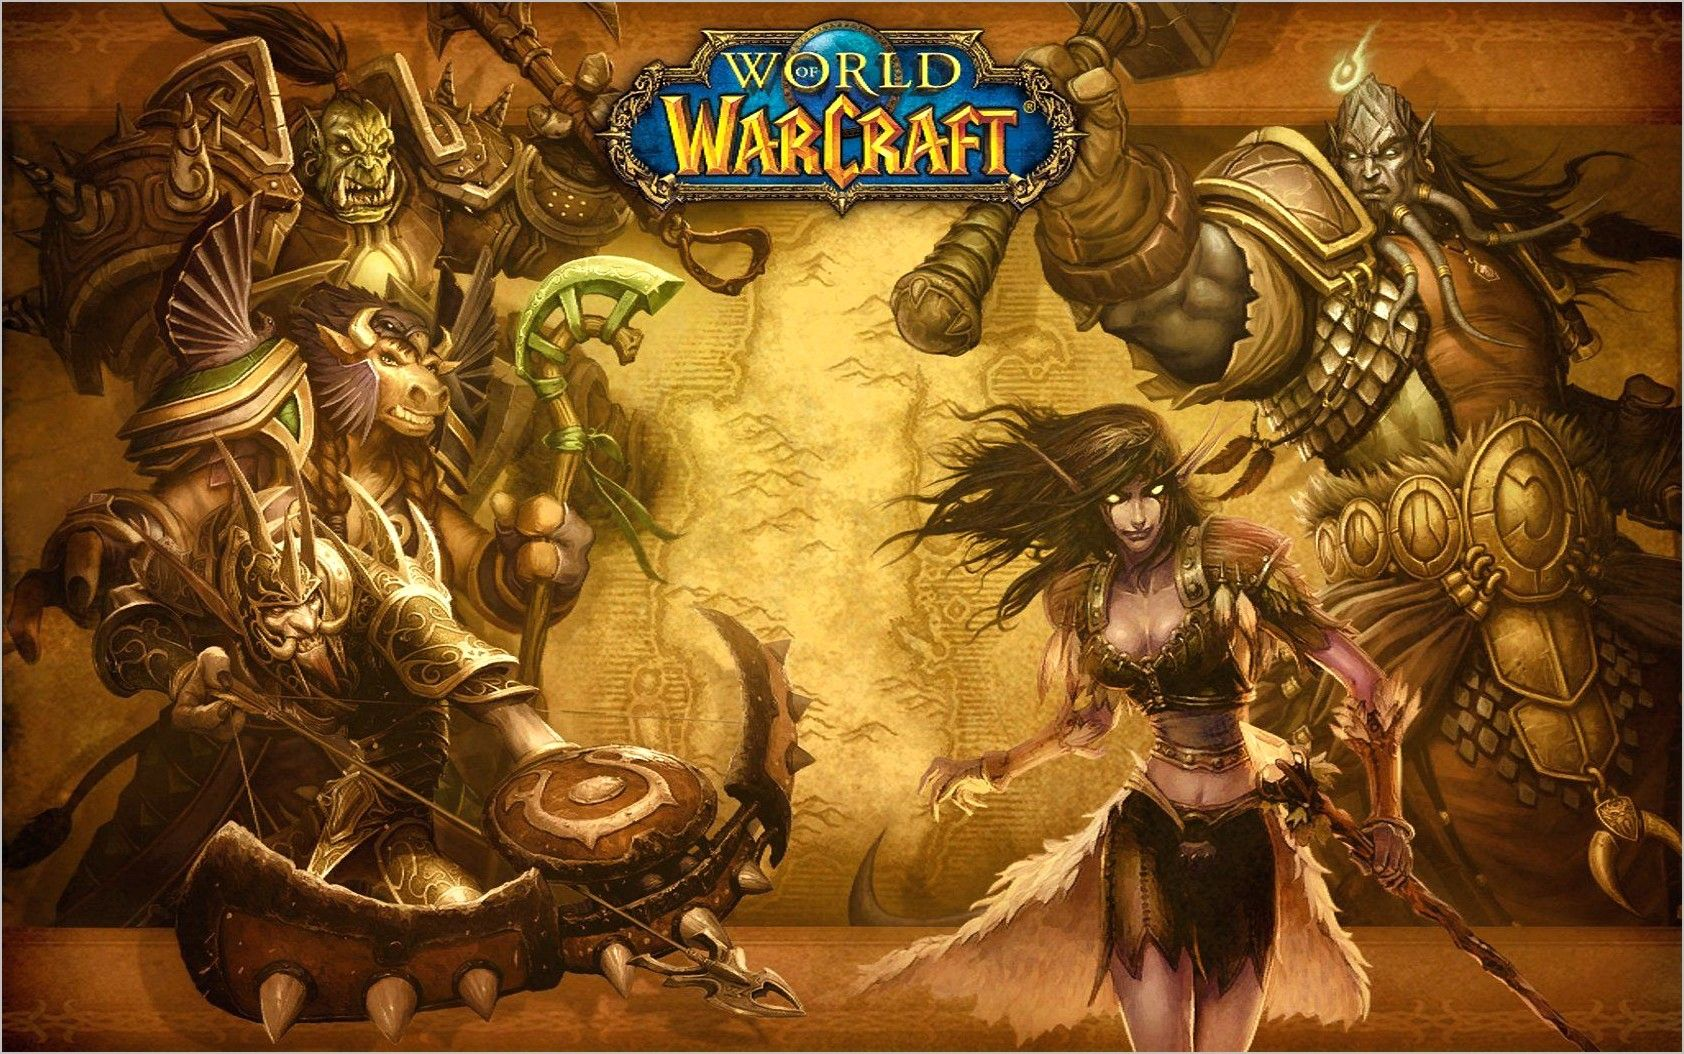 Native 4k Wallpaper World Of Warcraft In 2020 World Of Warcraft Wallpaper World Of Warcraft Warcraft